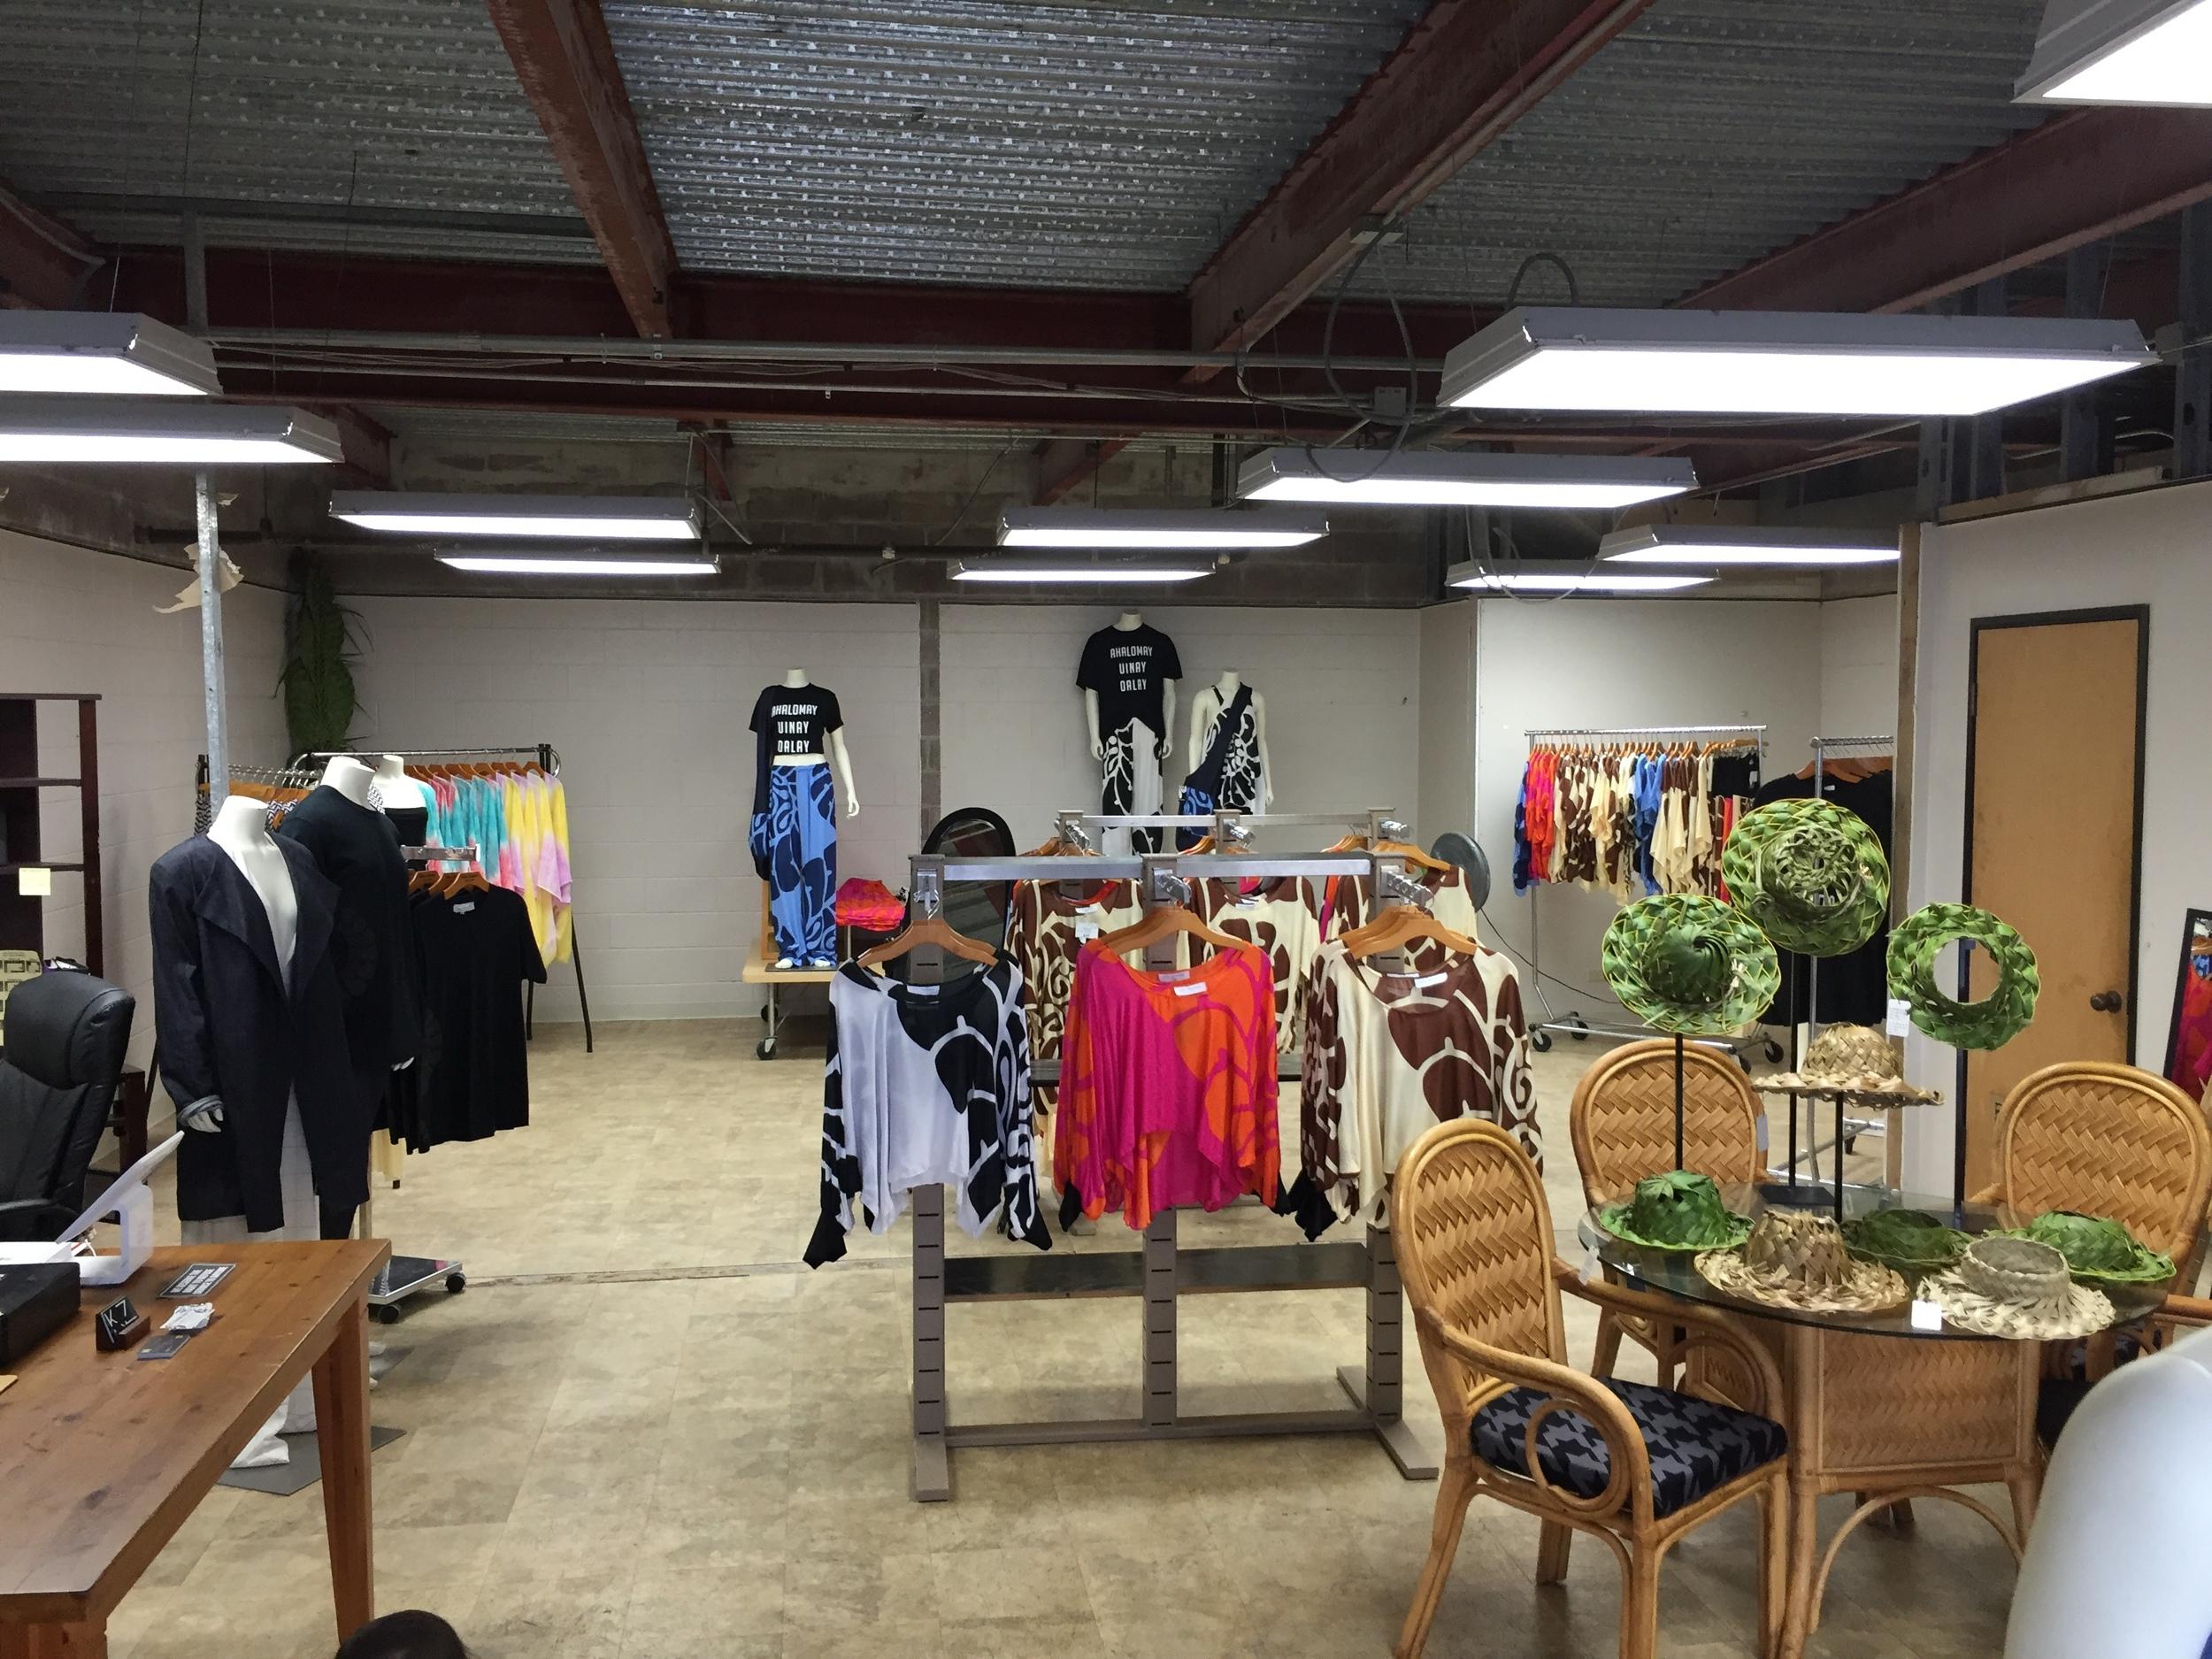 Shop our collections at  The Clique by KZ  99-1132 Iwaena St  Aiea, Hi  Mon-Fri 9-5  Sat 9-2  Sunday Closed